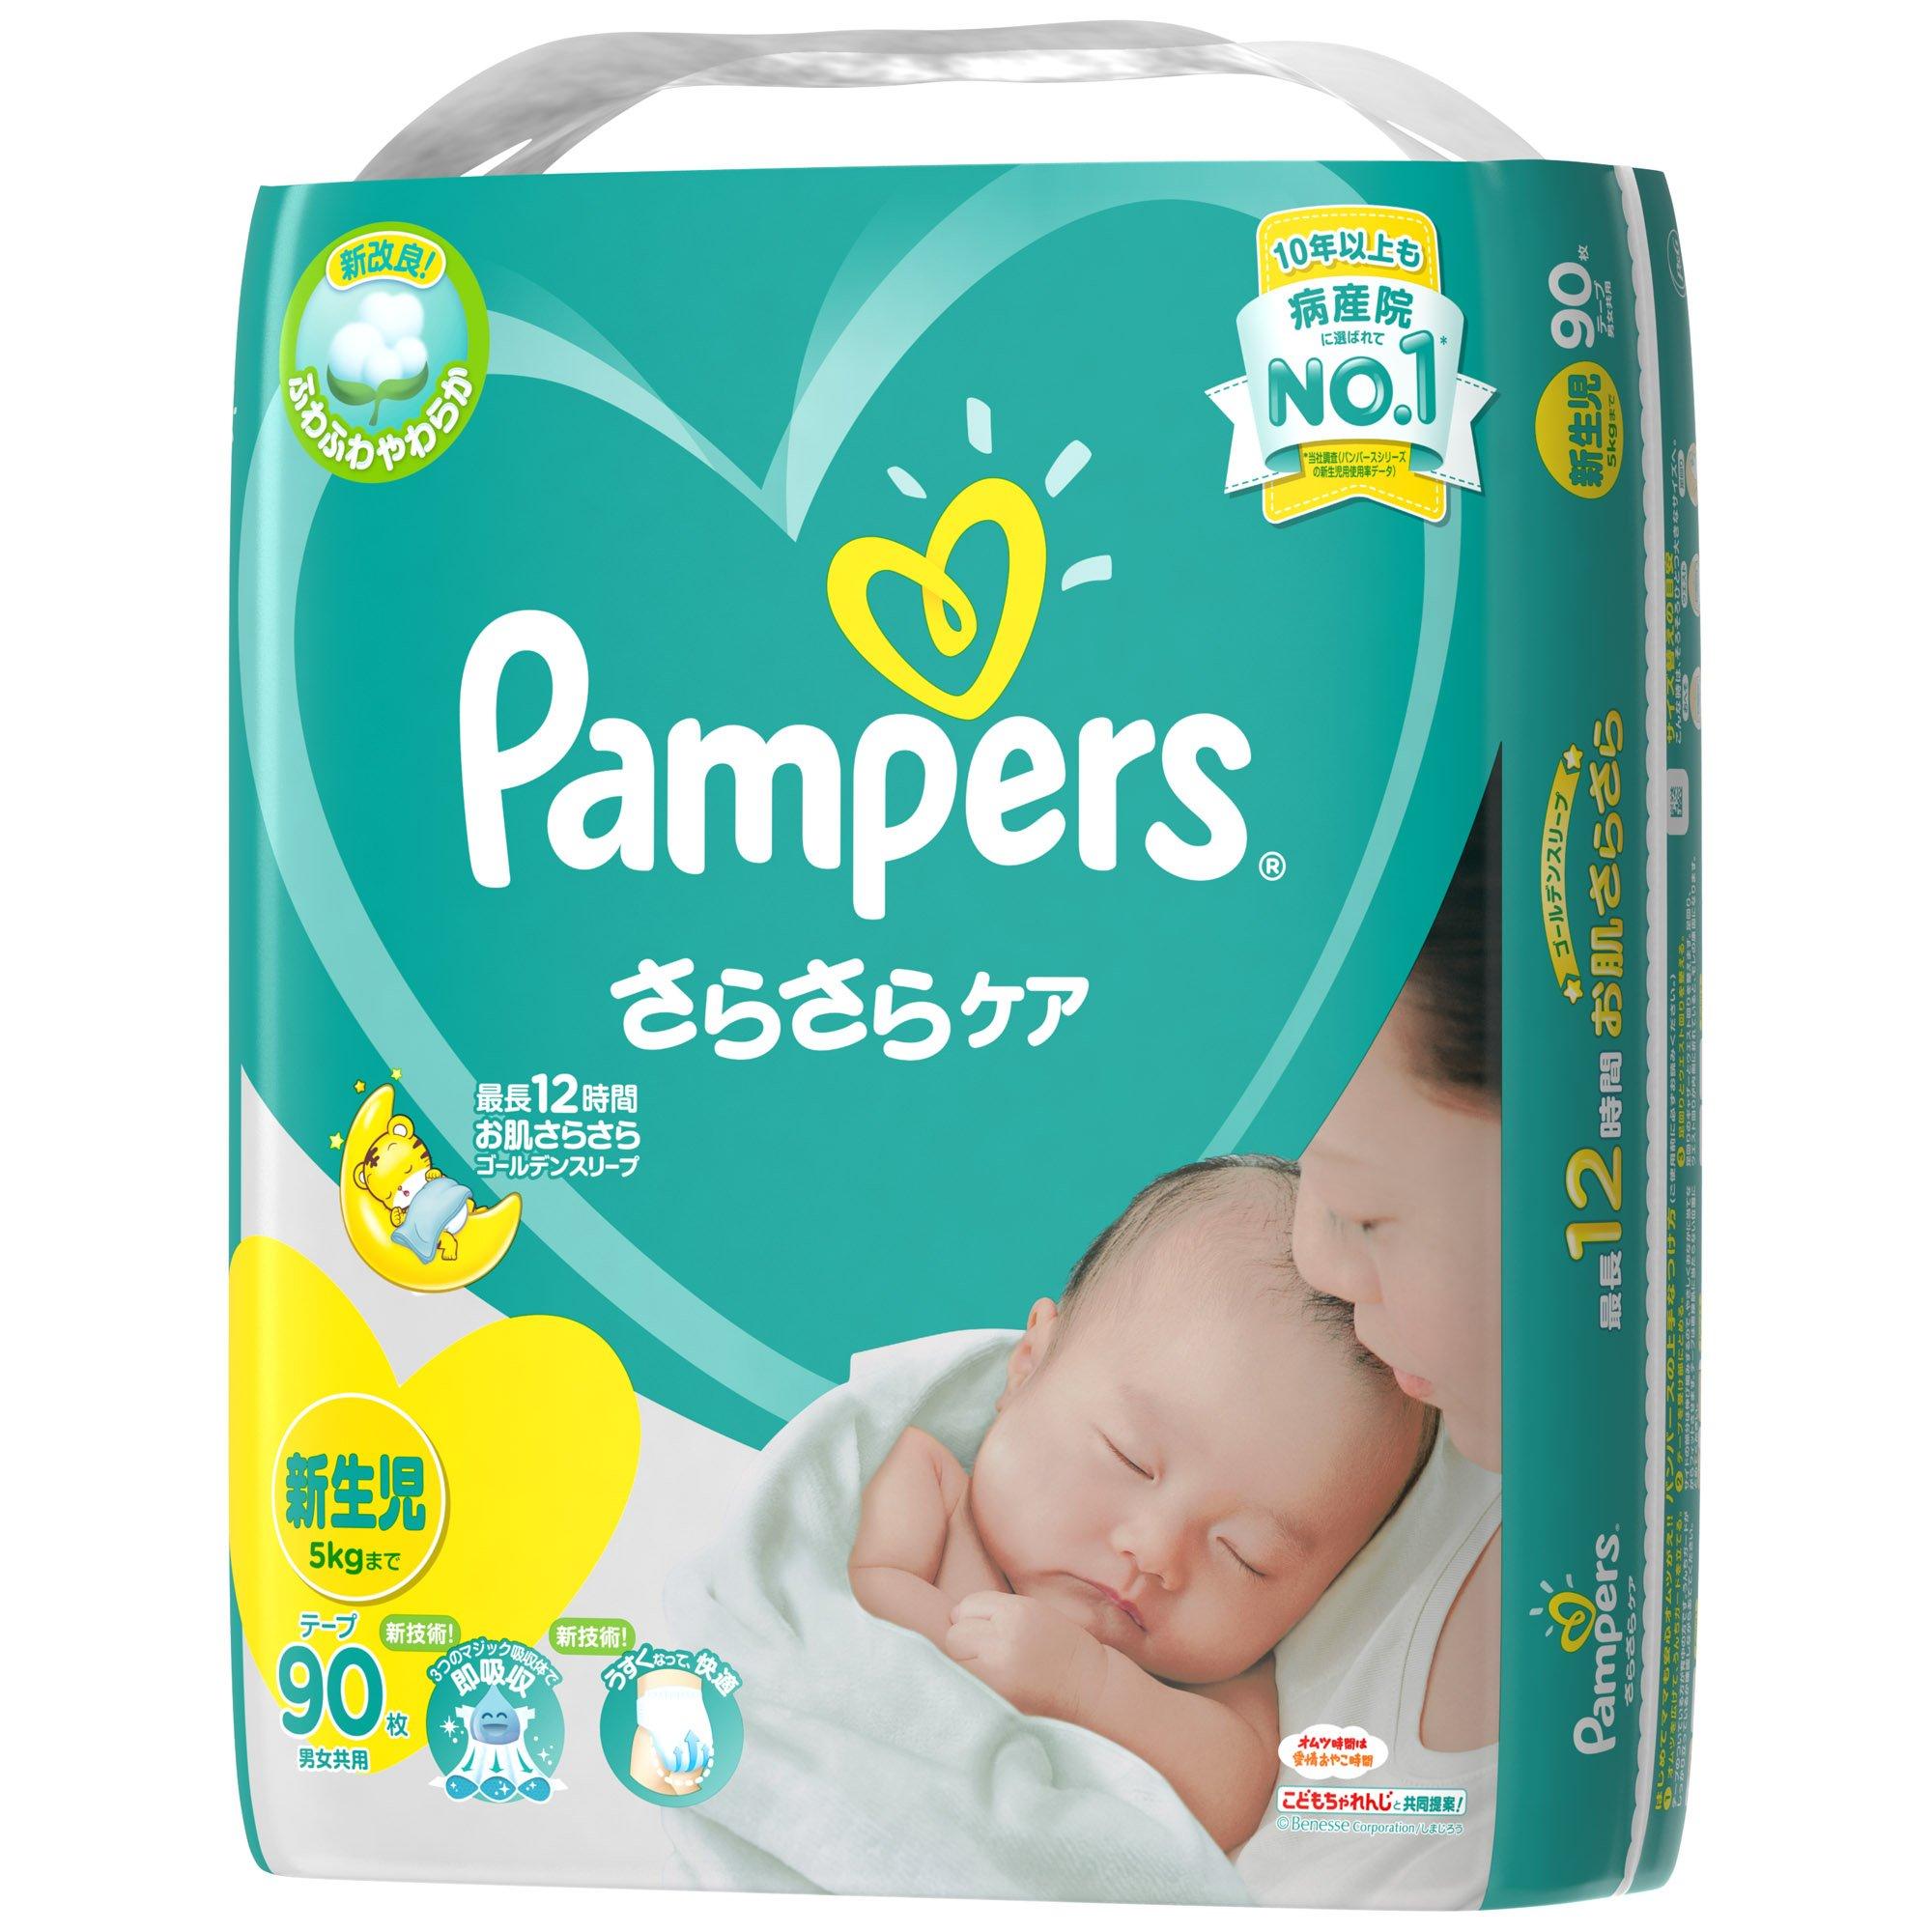 Pampers japan   pampers Cotton care newborn infants 【 ~5kg 】 90sheets